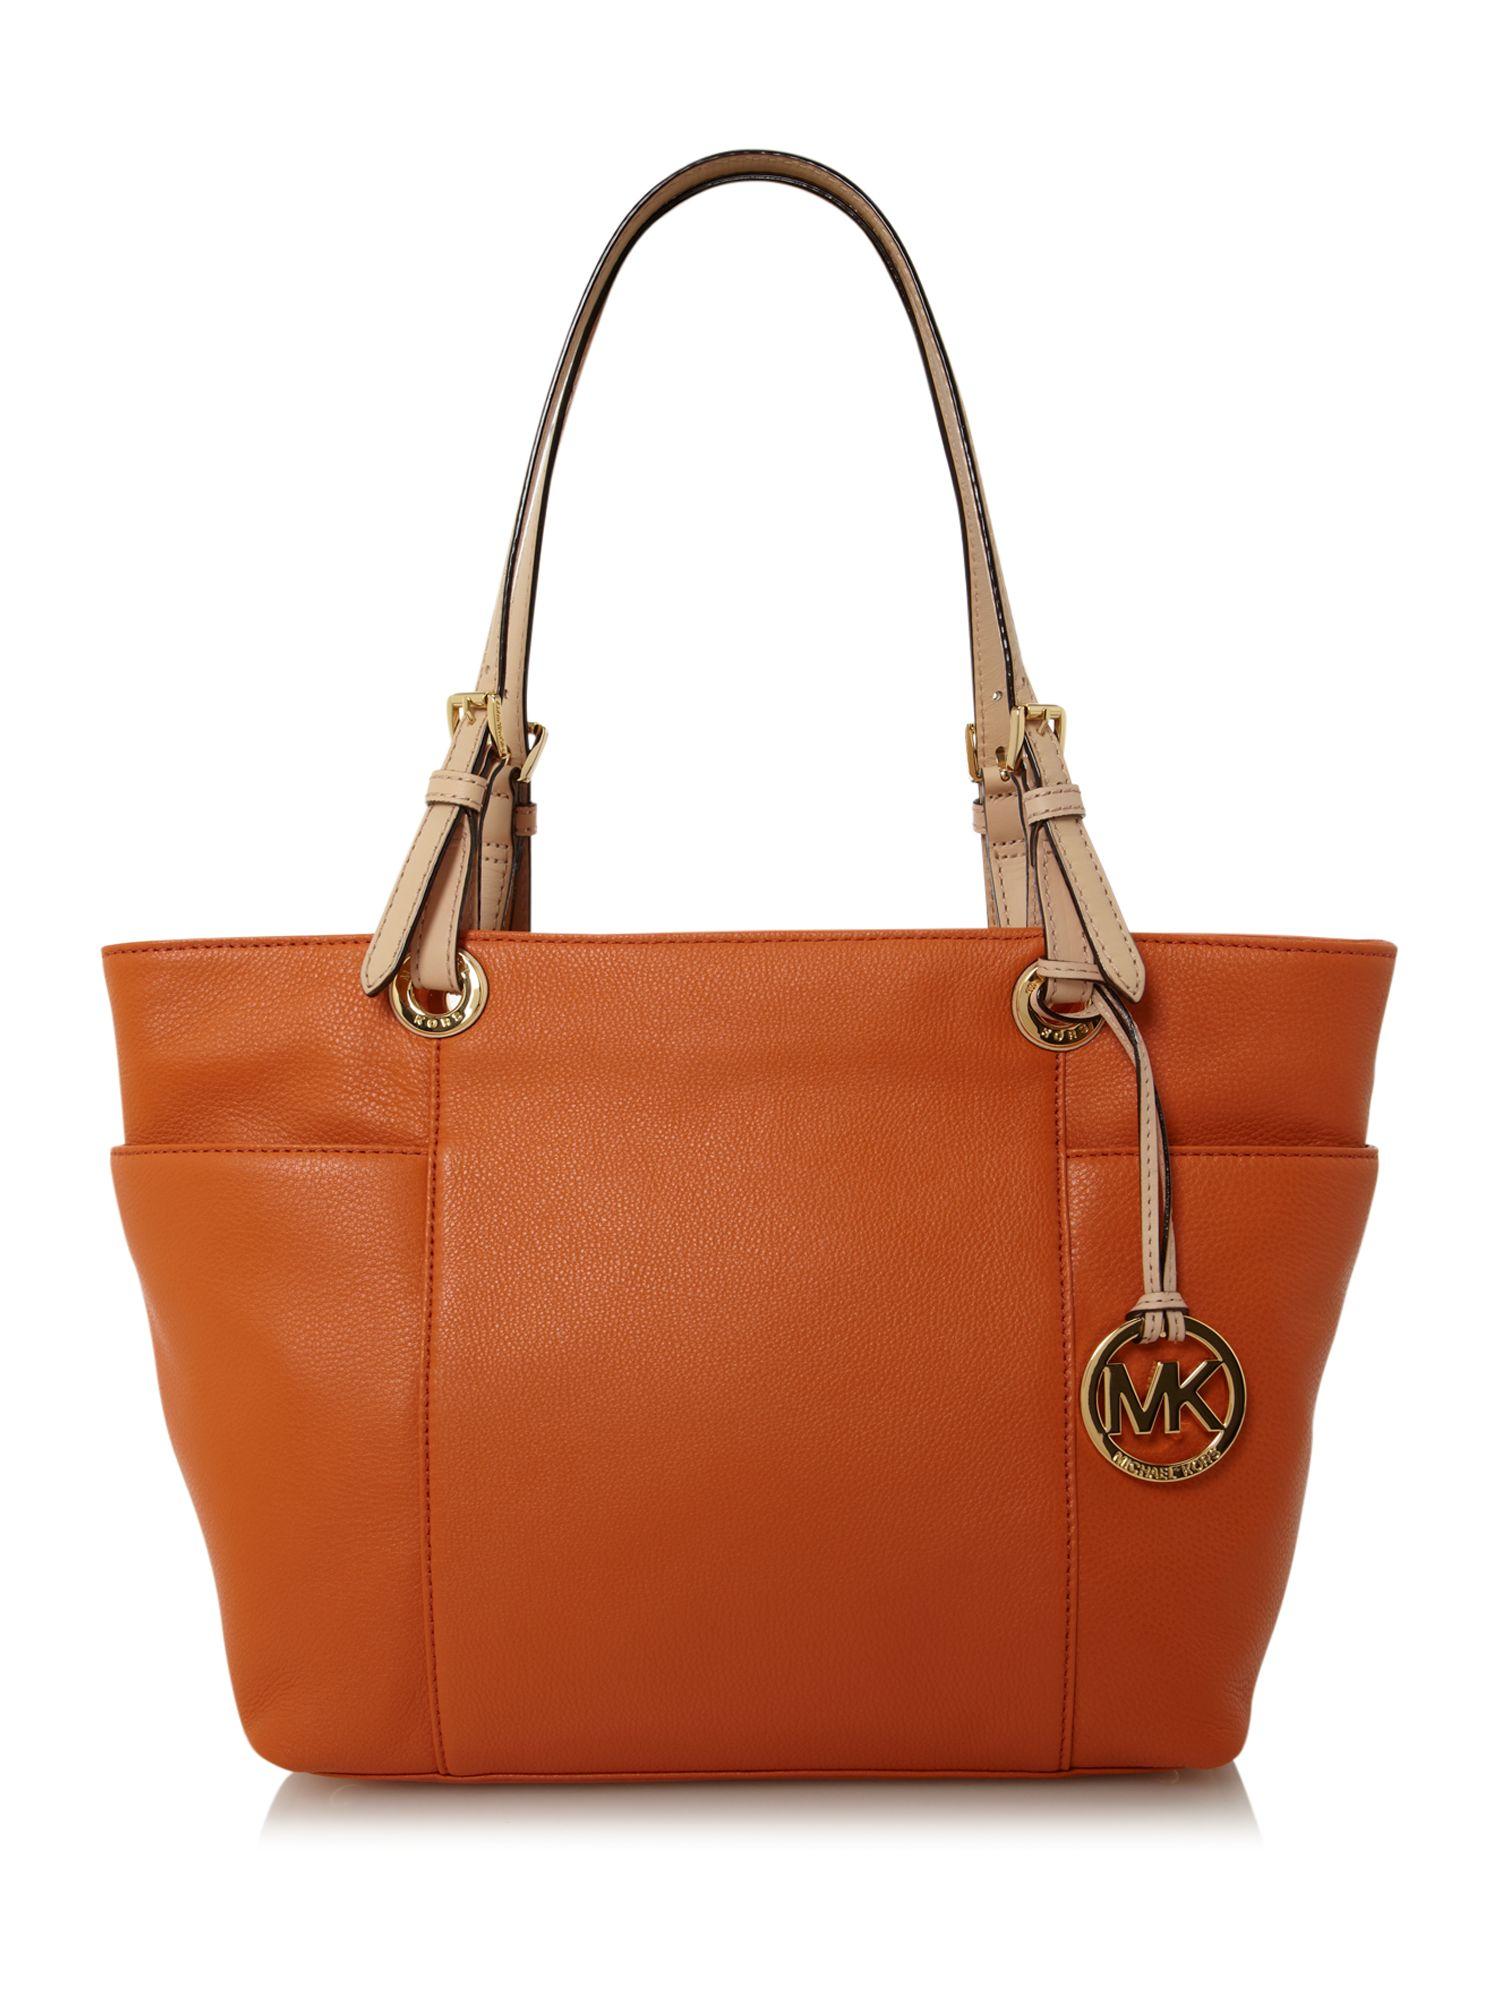 1781386d9a80 Michael Kors Handbags Orange Tote   Stanford Center for Opportunity ...